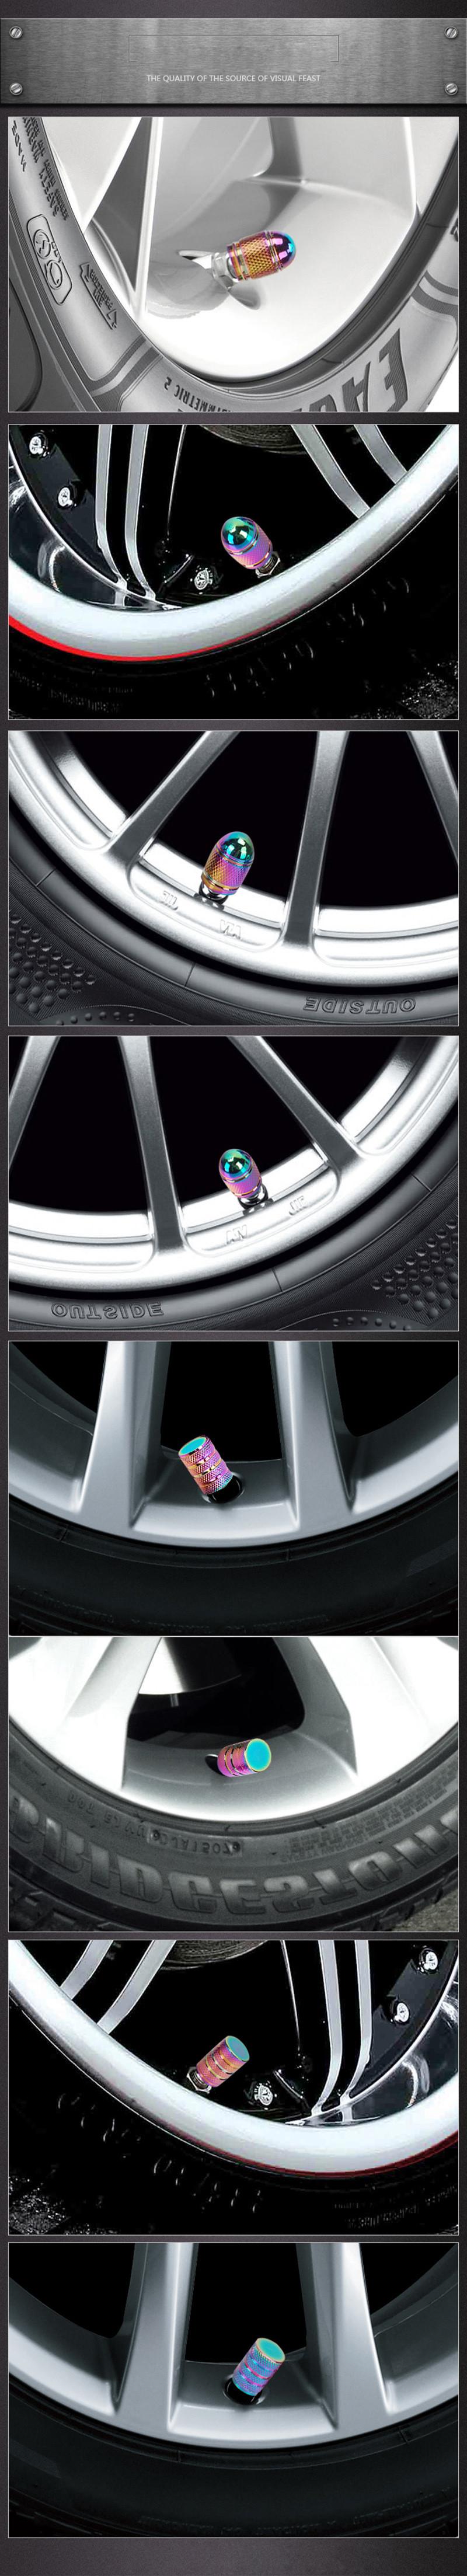 AllRing Alloy Auto Valve Caps Tappi antipolvere per valvola pneumatico auto con portachiavi Mercedes